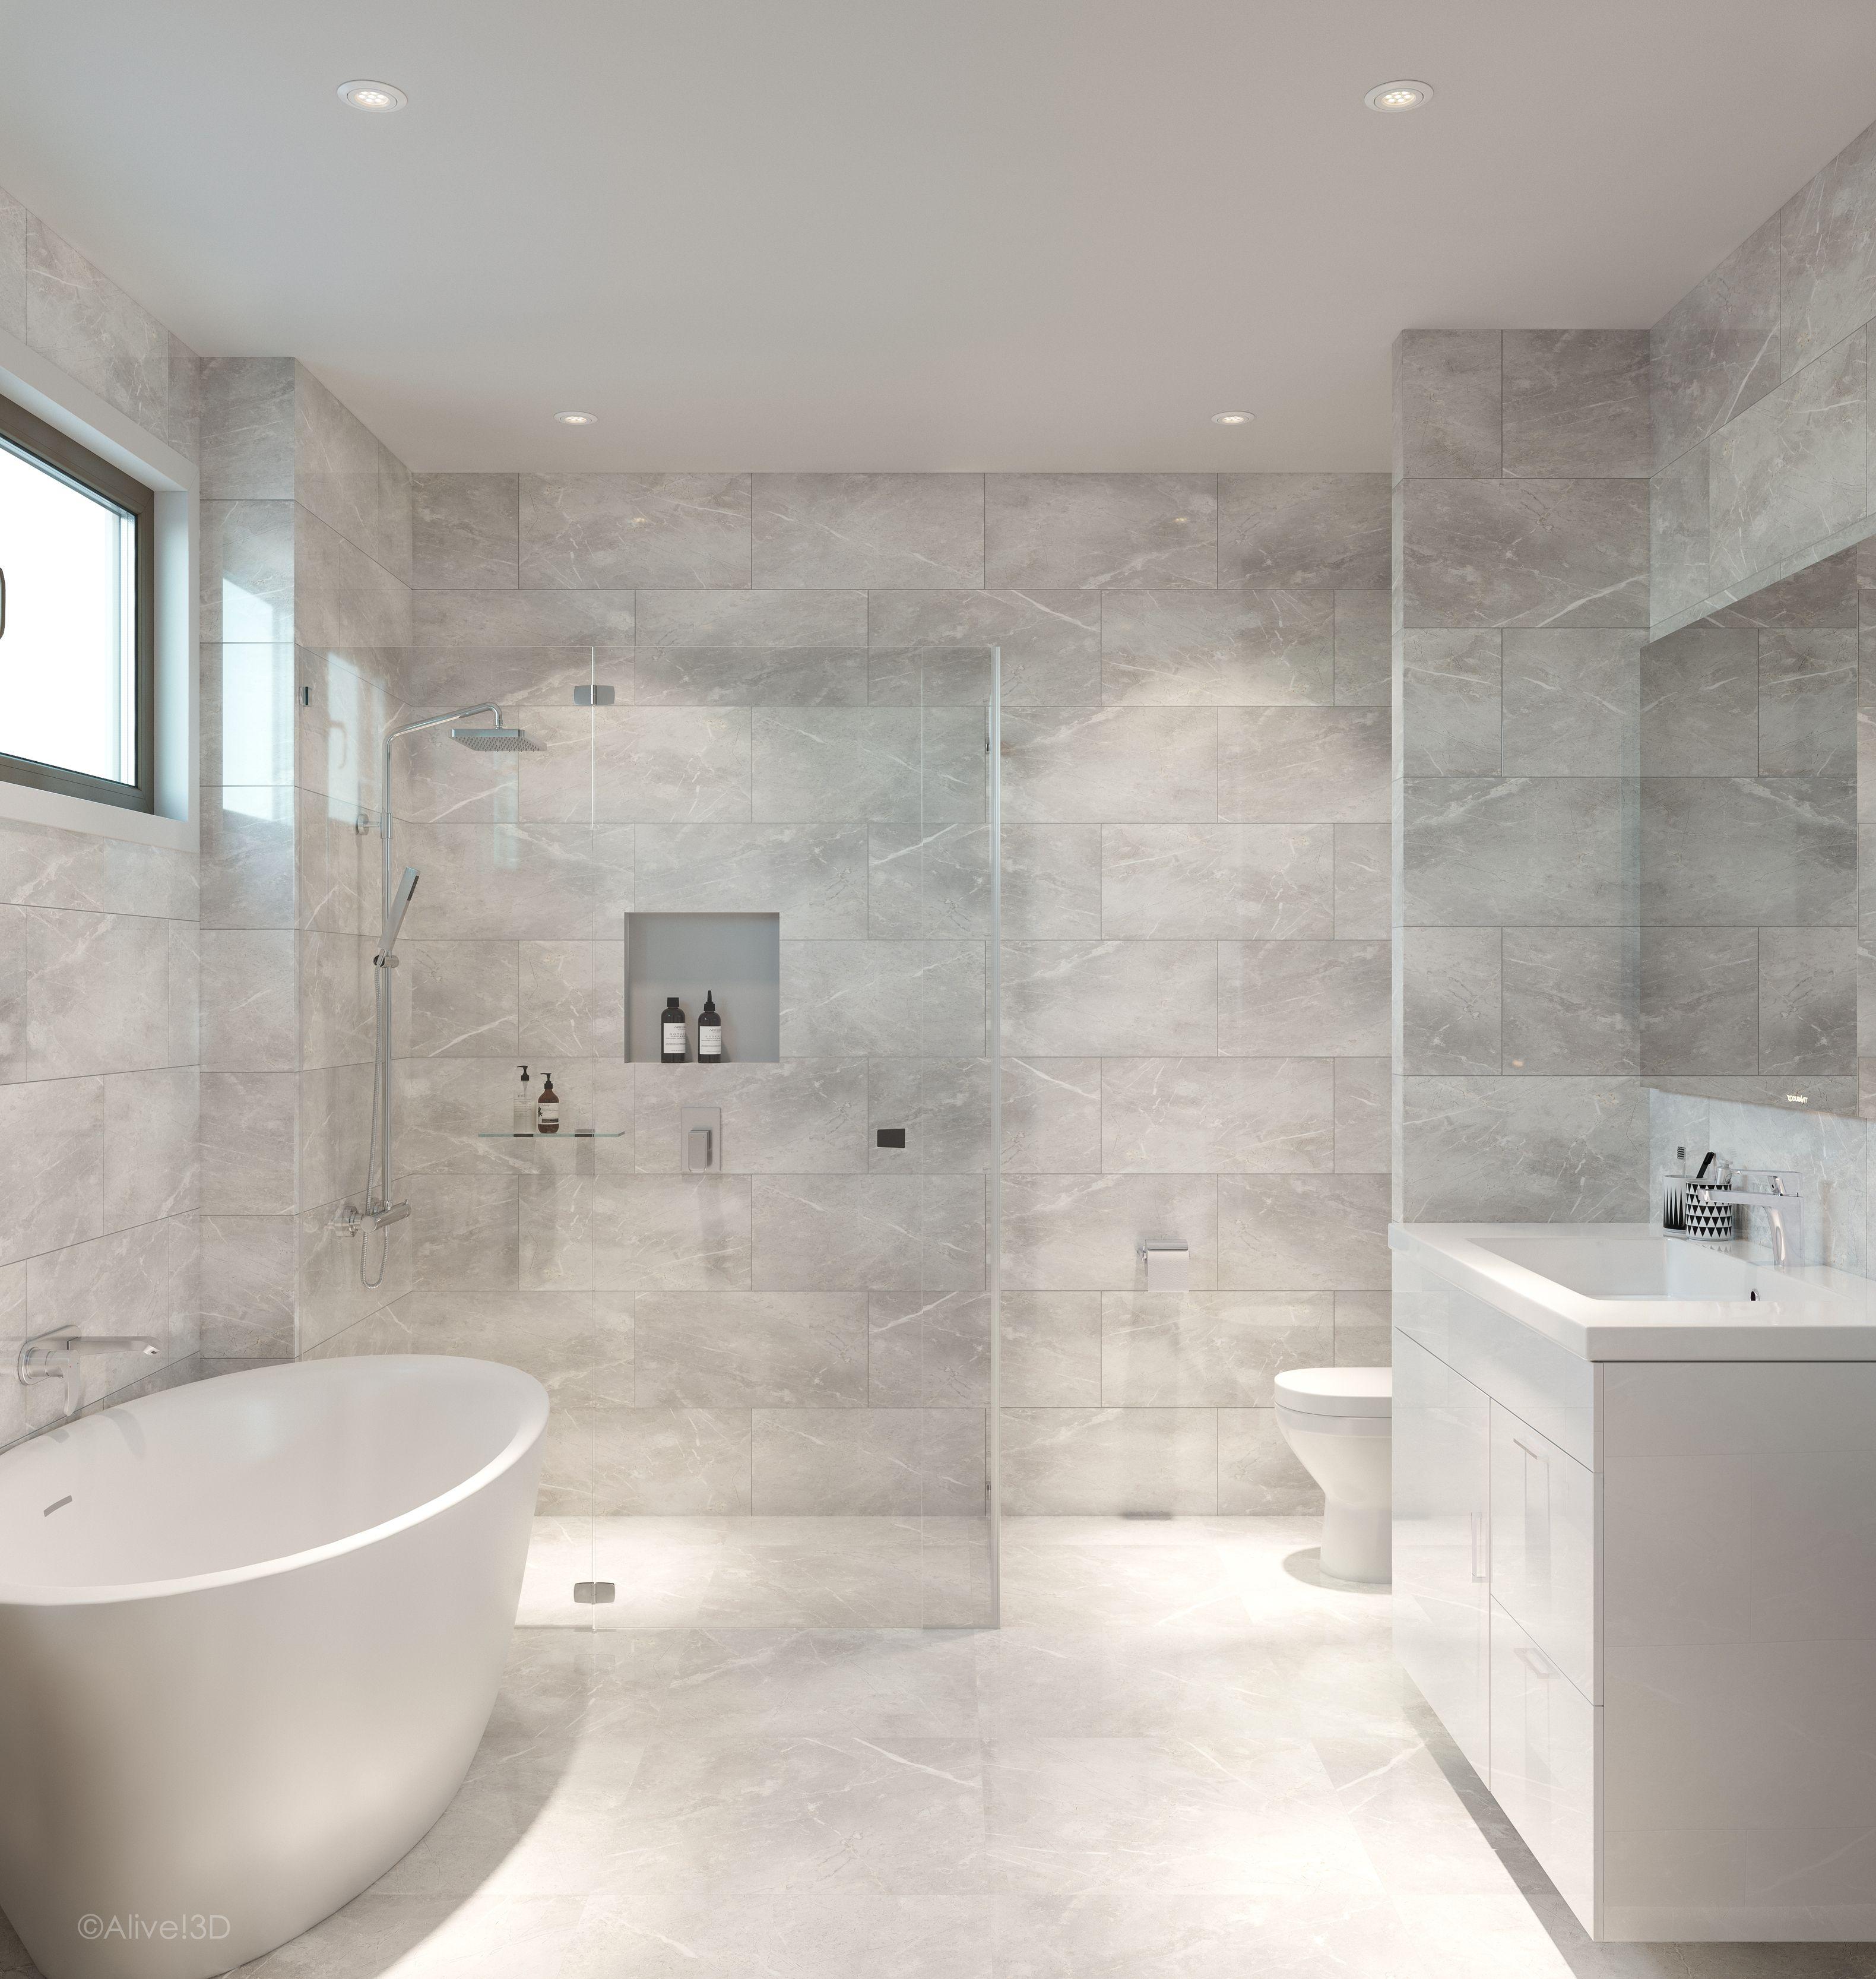 Luxury Ensuite Bathroom Inspiration Modern Bathroom Design Inspiration Bathroom Tile Inspiration